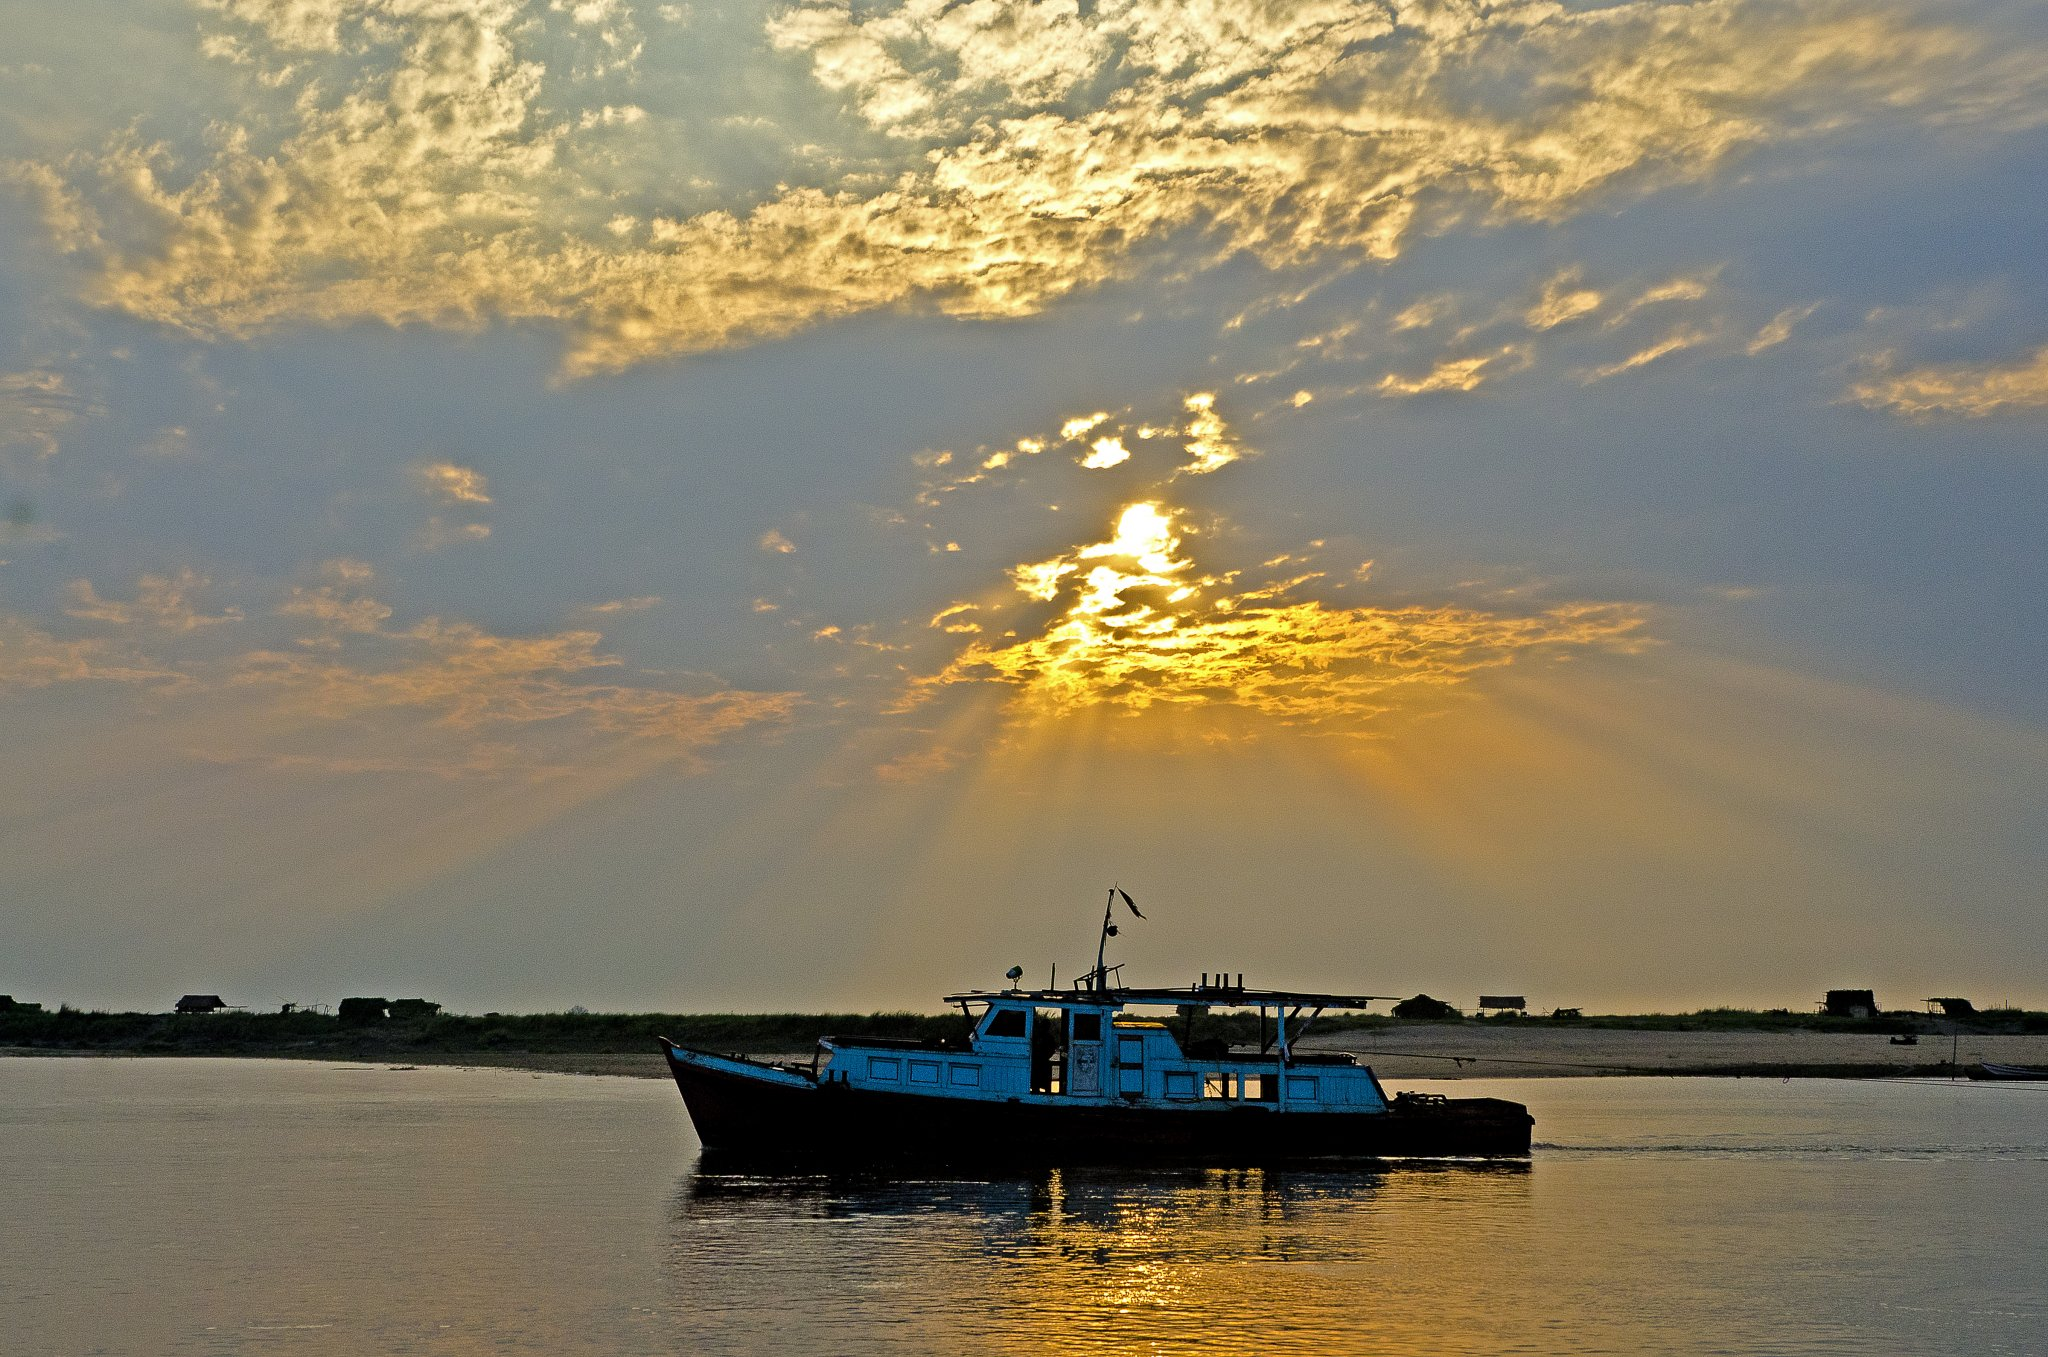 Sunrise on the Irrawaddady River.jpg